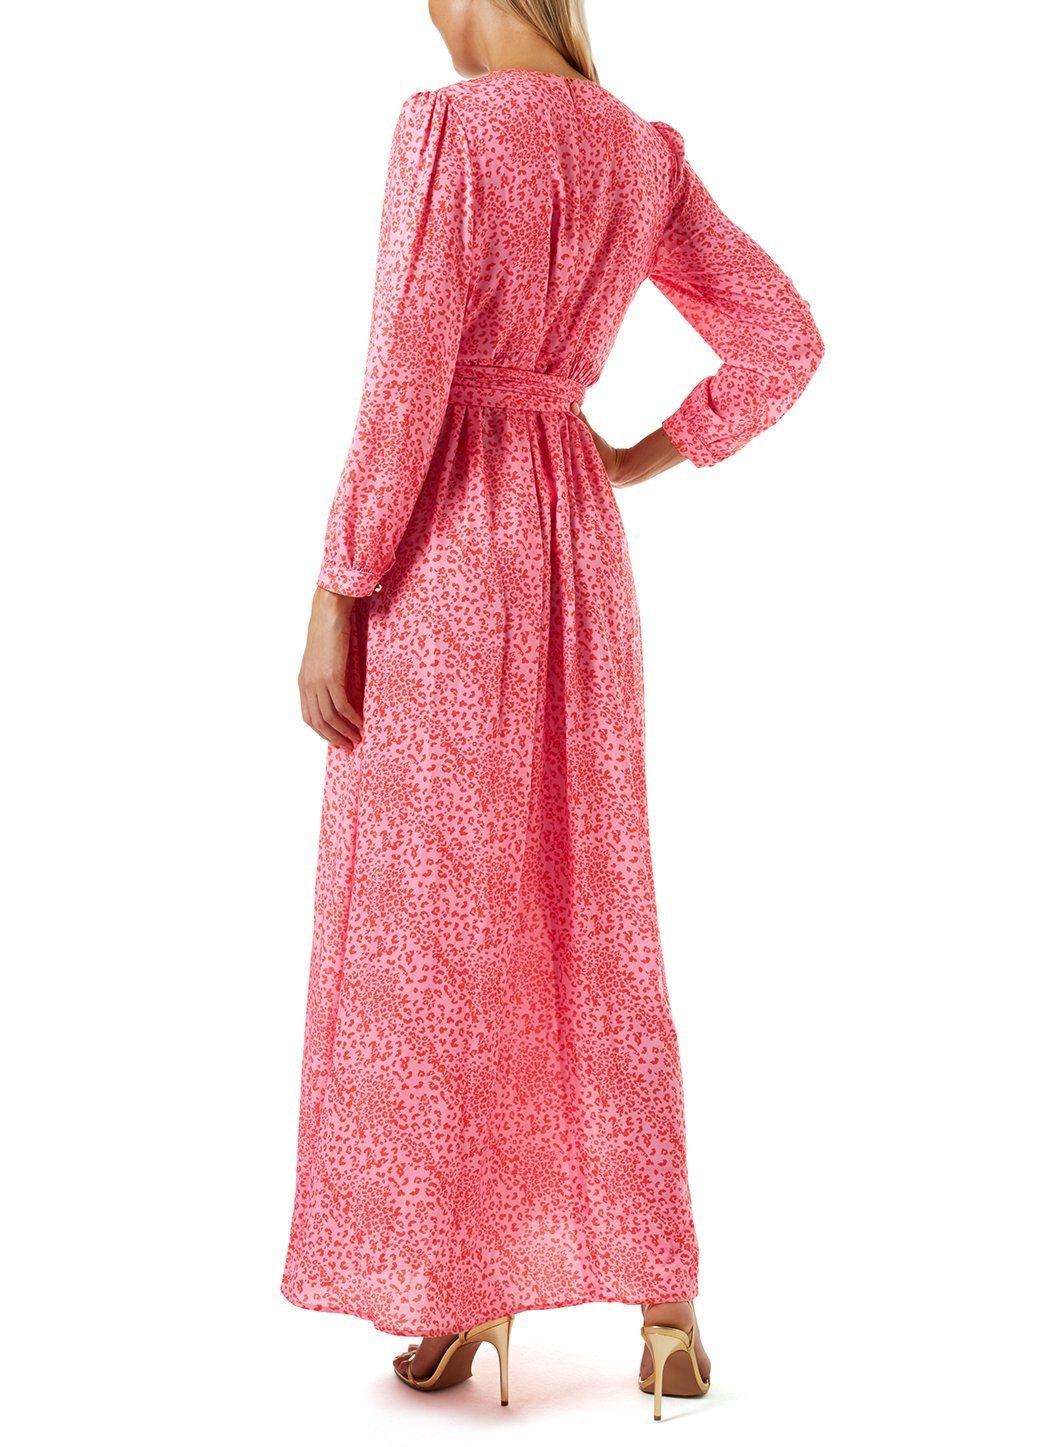 Cardinal_Sahara_Dress_B_1056x.progressive